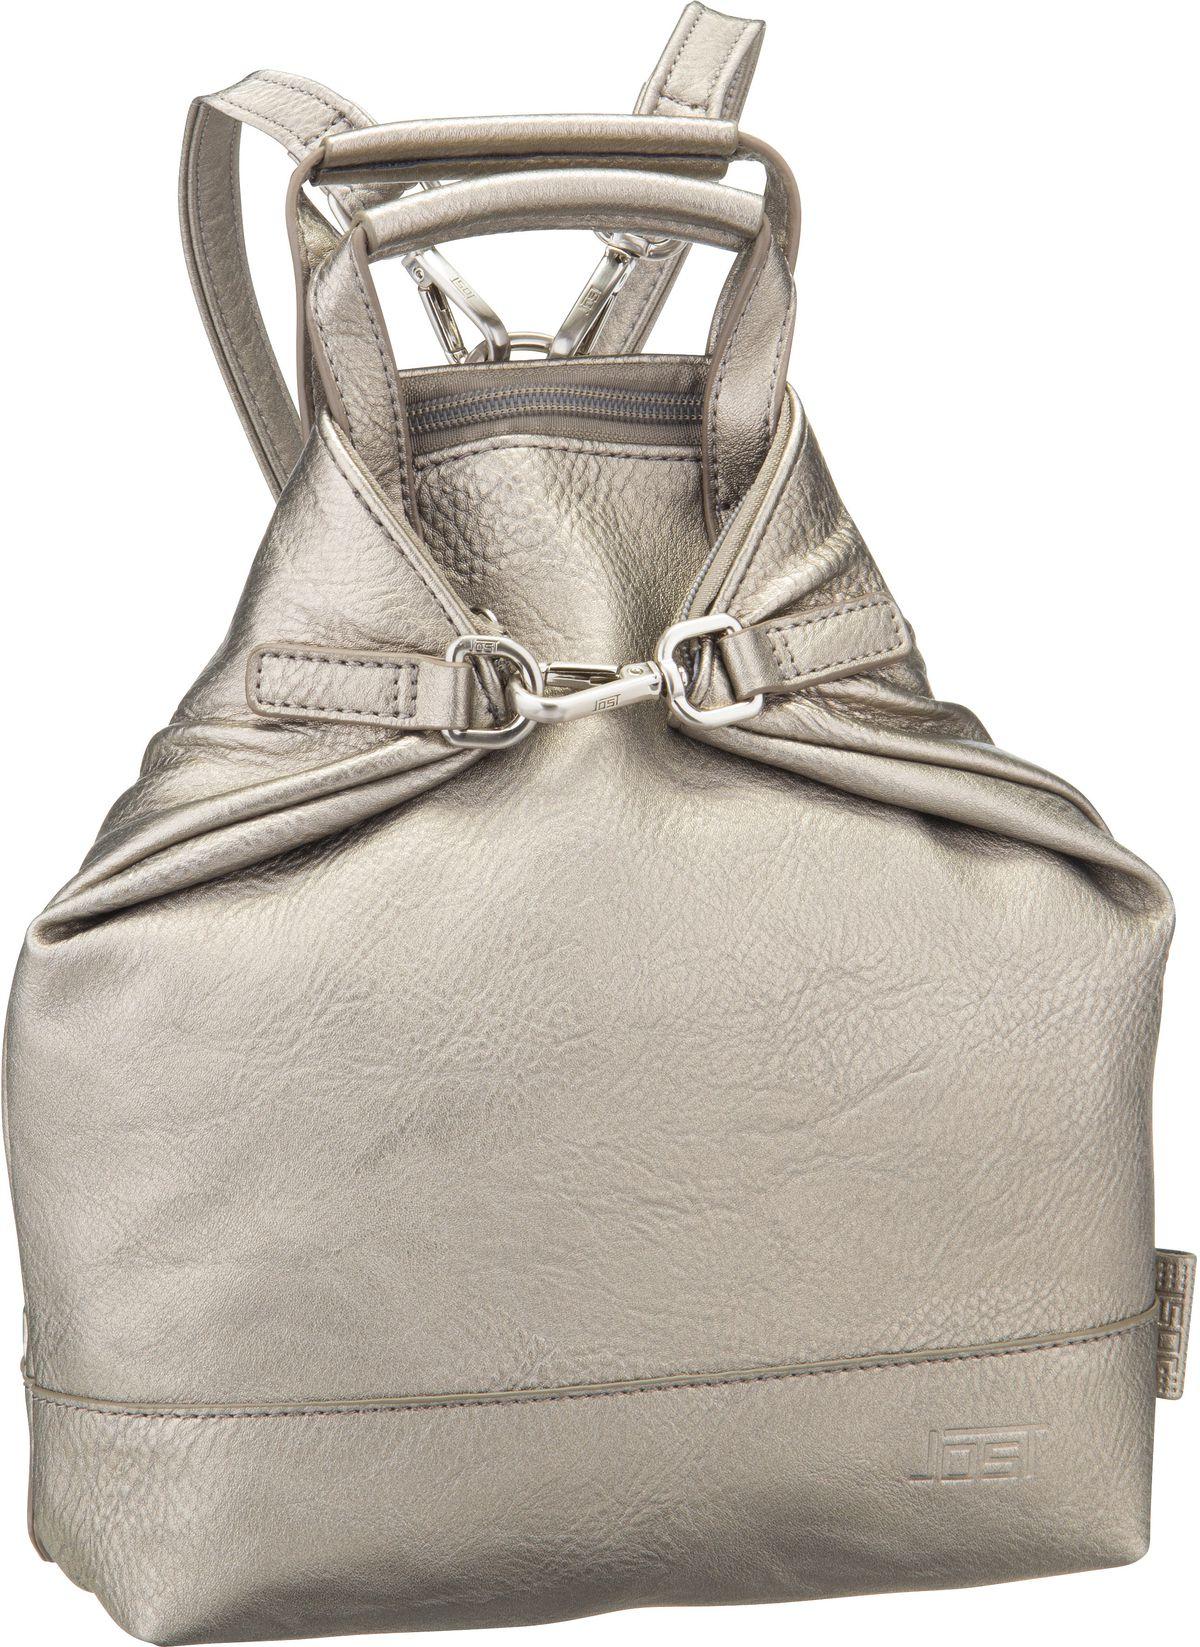 Rucksack / Daypack Merritt 2669 X-Change Bag Mini Silver